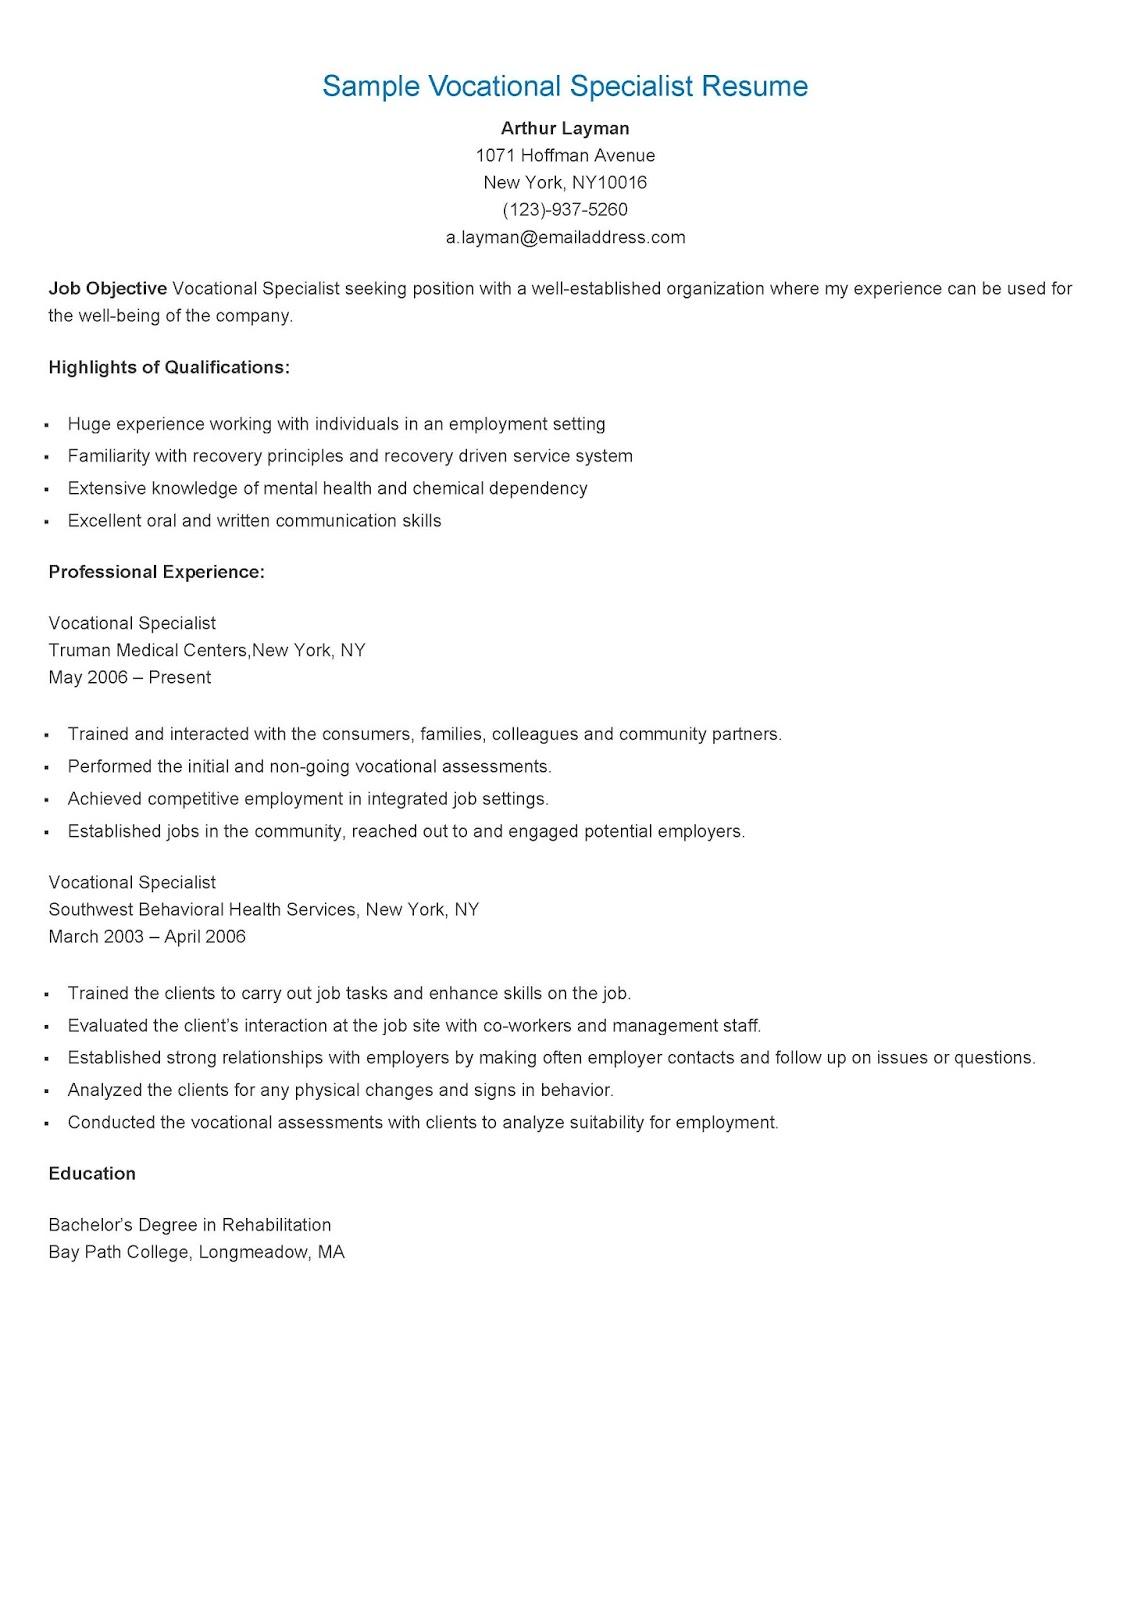 resume format for vocational 28 images brilliant